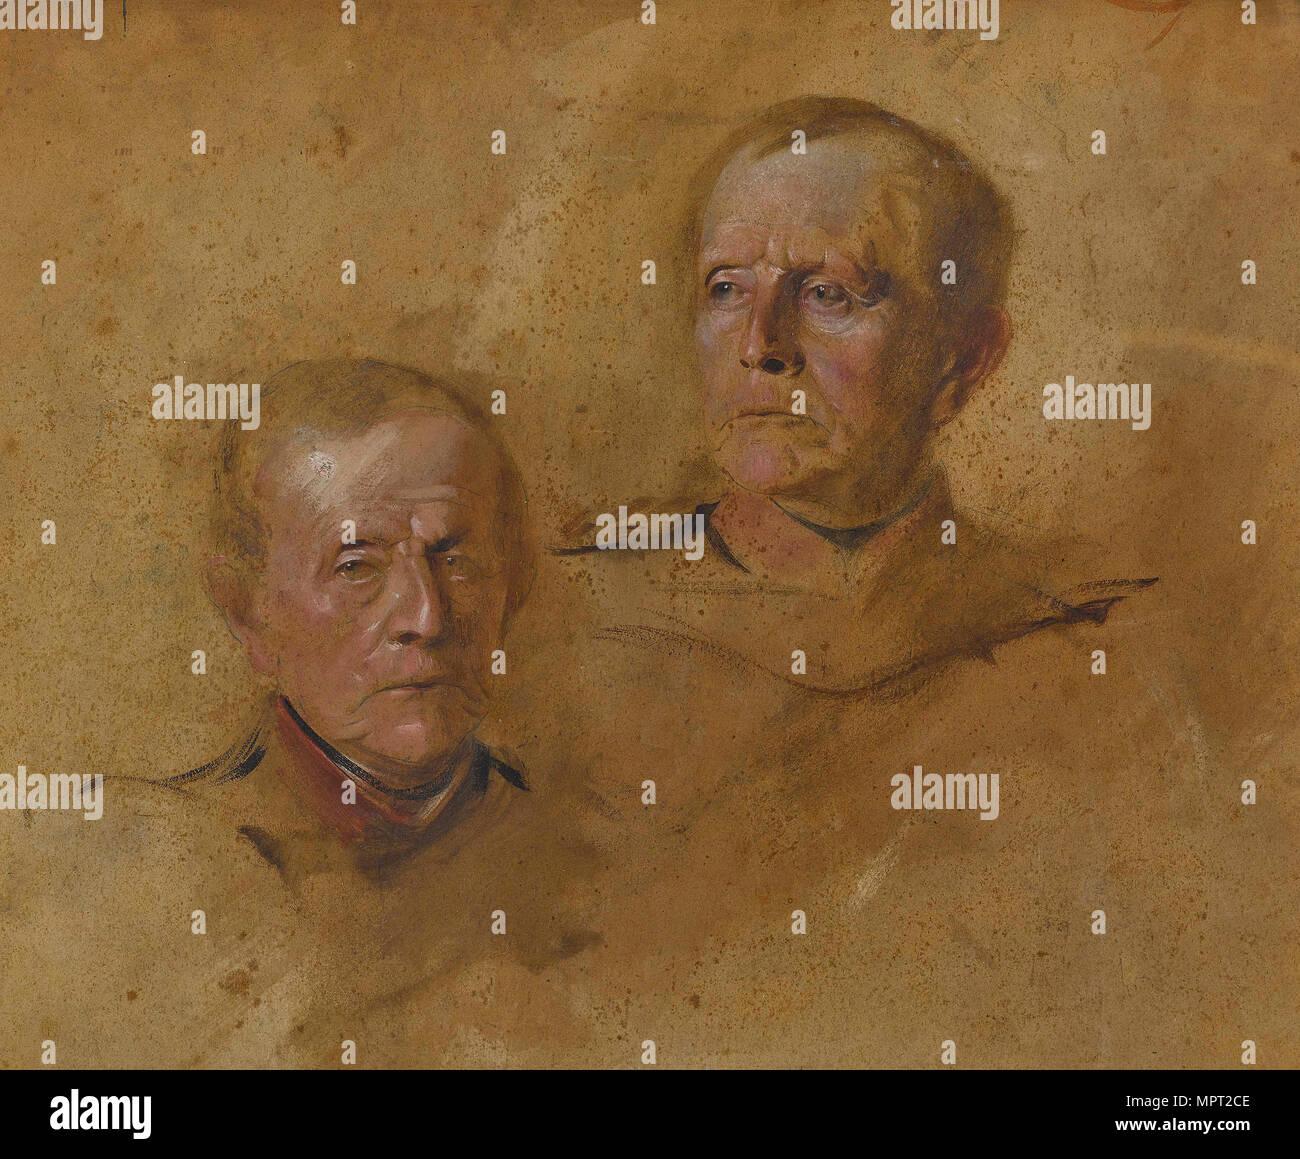 Portrait Studies of Field Marshal Helmuth Graf von Moltke (1800-1891), ca 1880-1885. - Stock Image